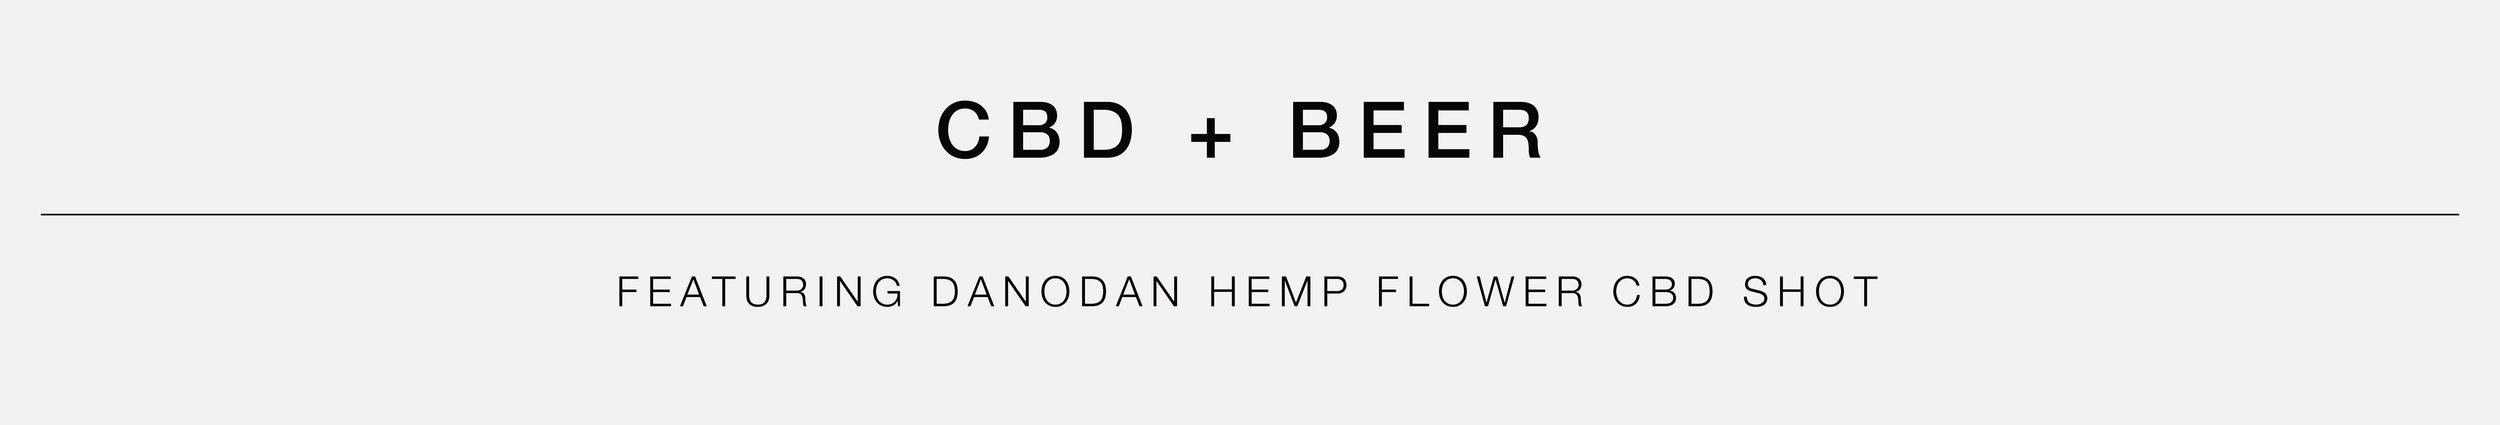 DANODAN CBD + BEER BANNER.jpg